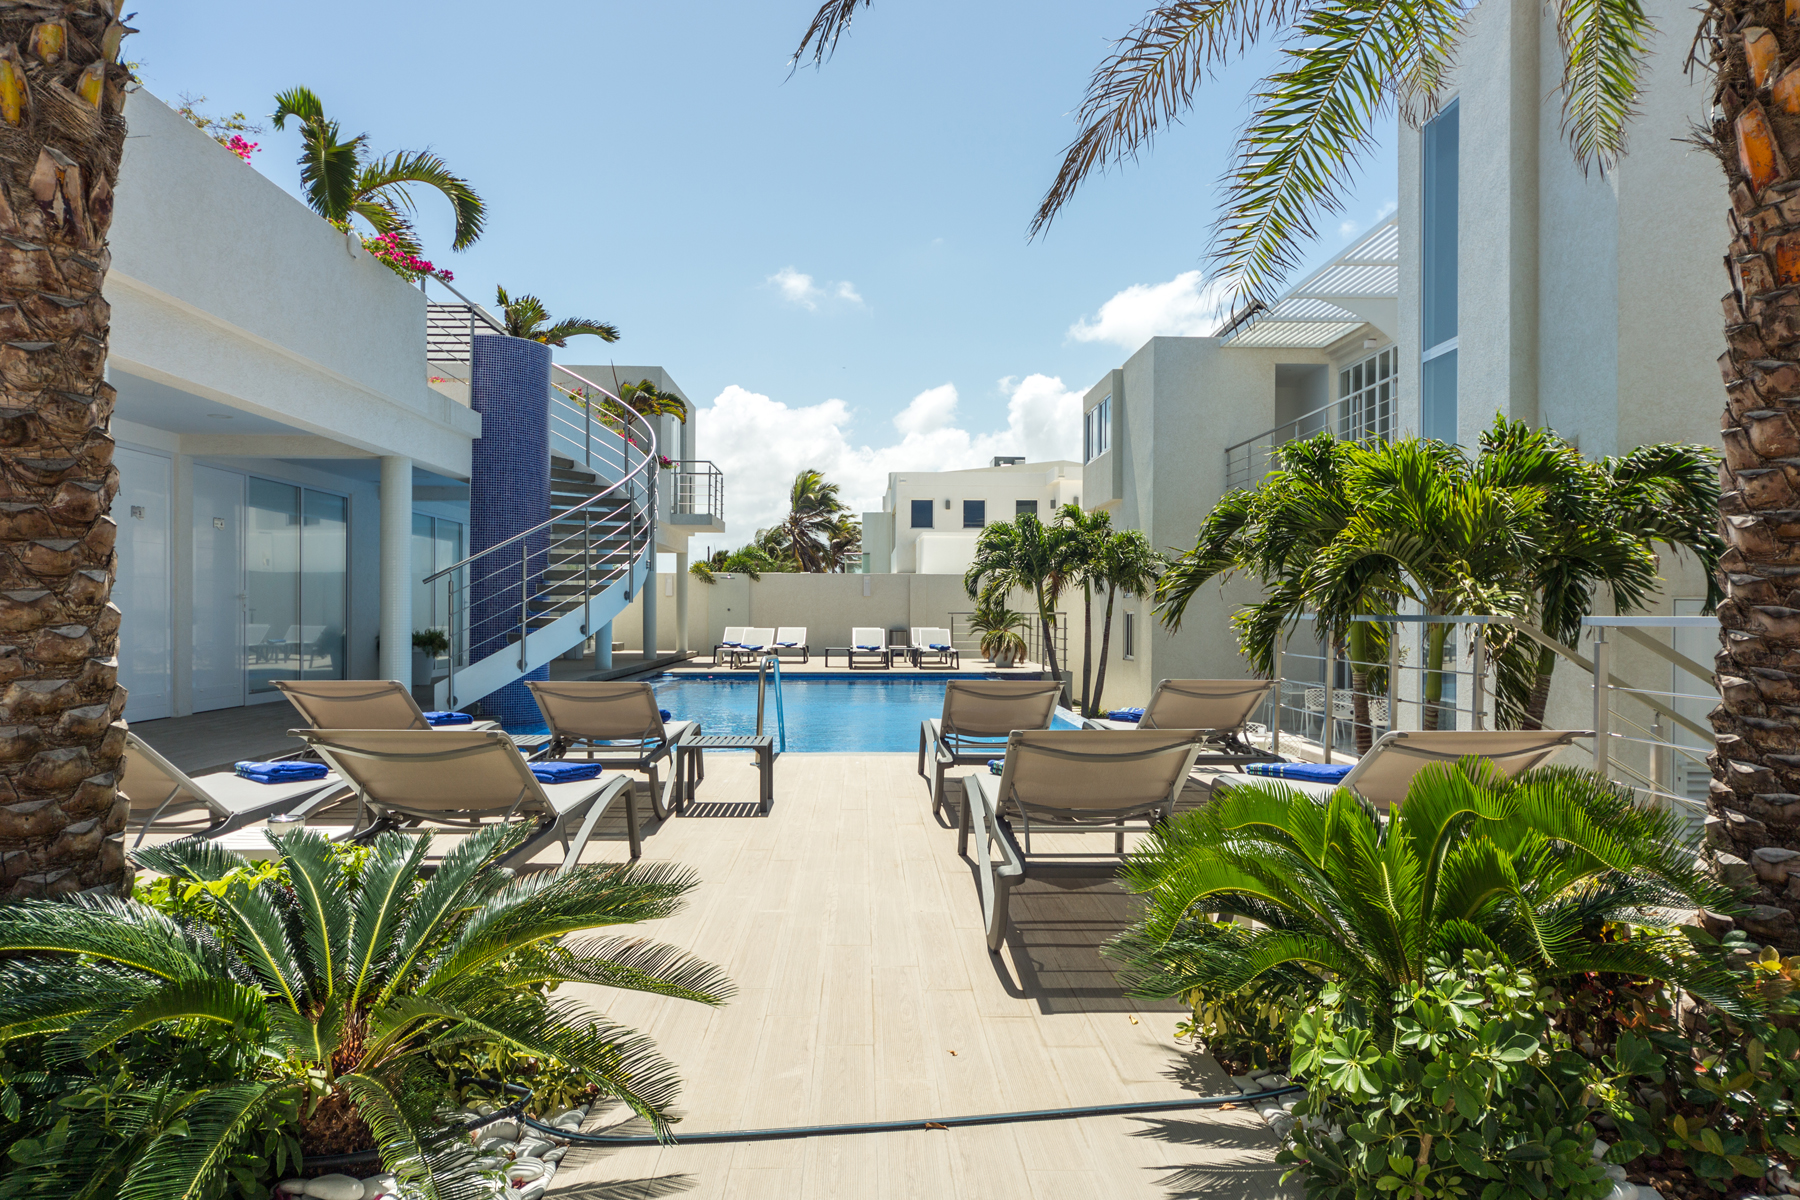 Additional photo for property listing at OceanZ Boutique Hotel Malmok, Aruba Aruba